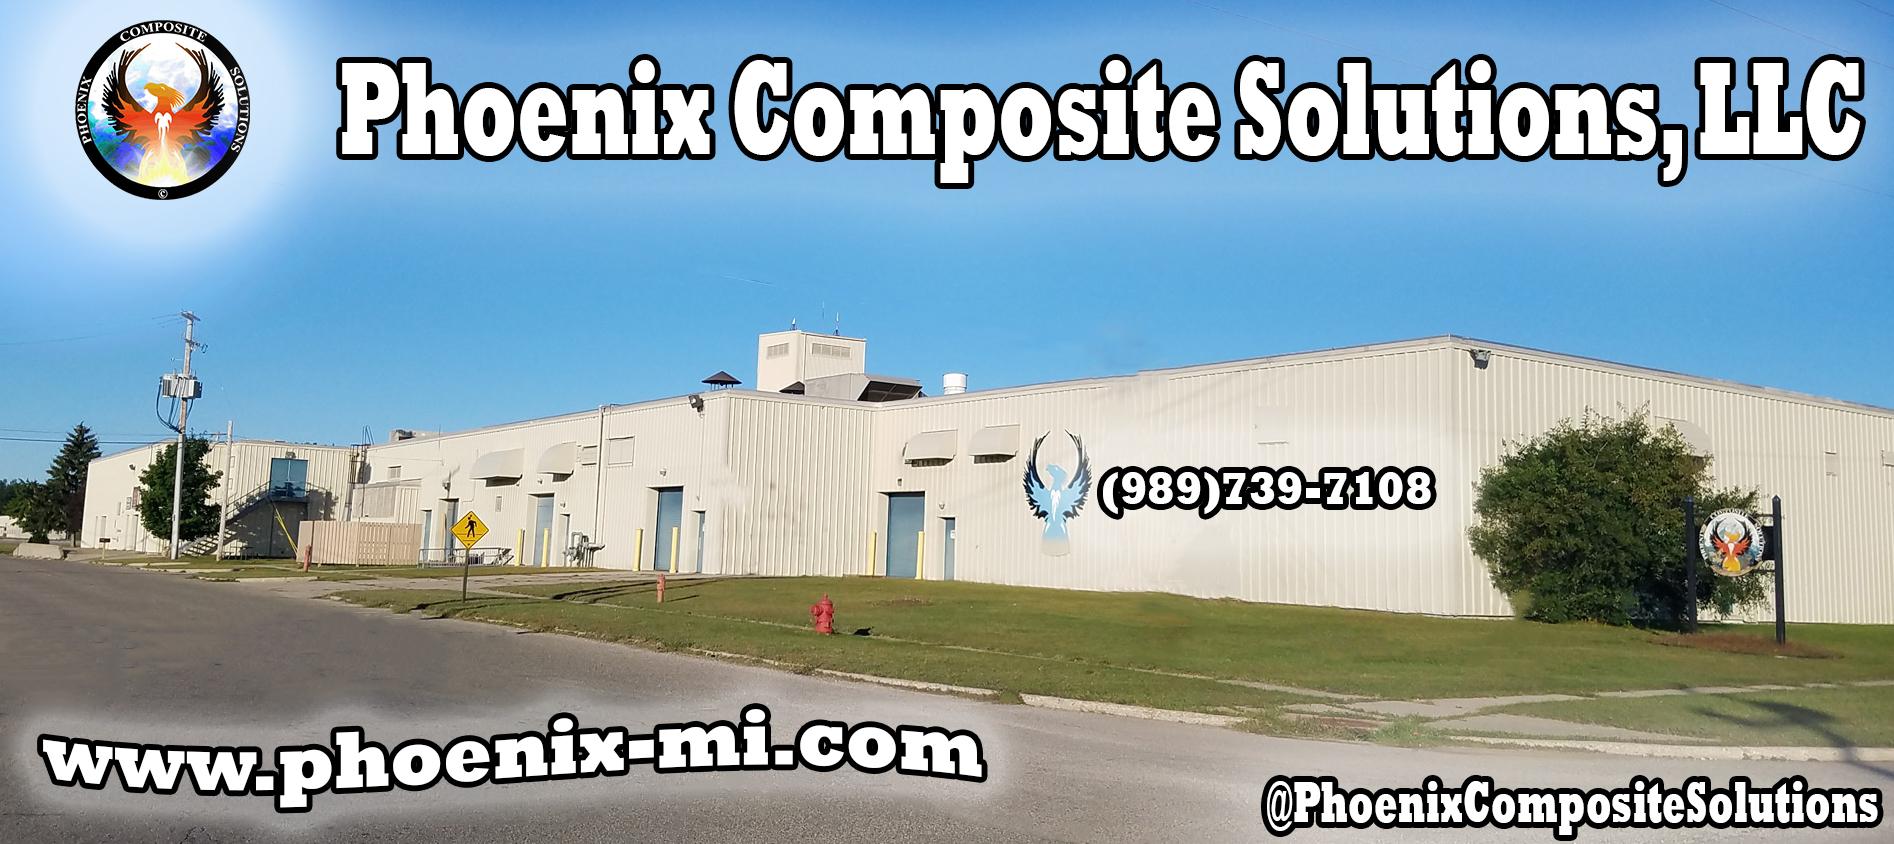 Phoenix-Composite-Solutions